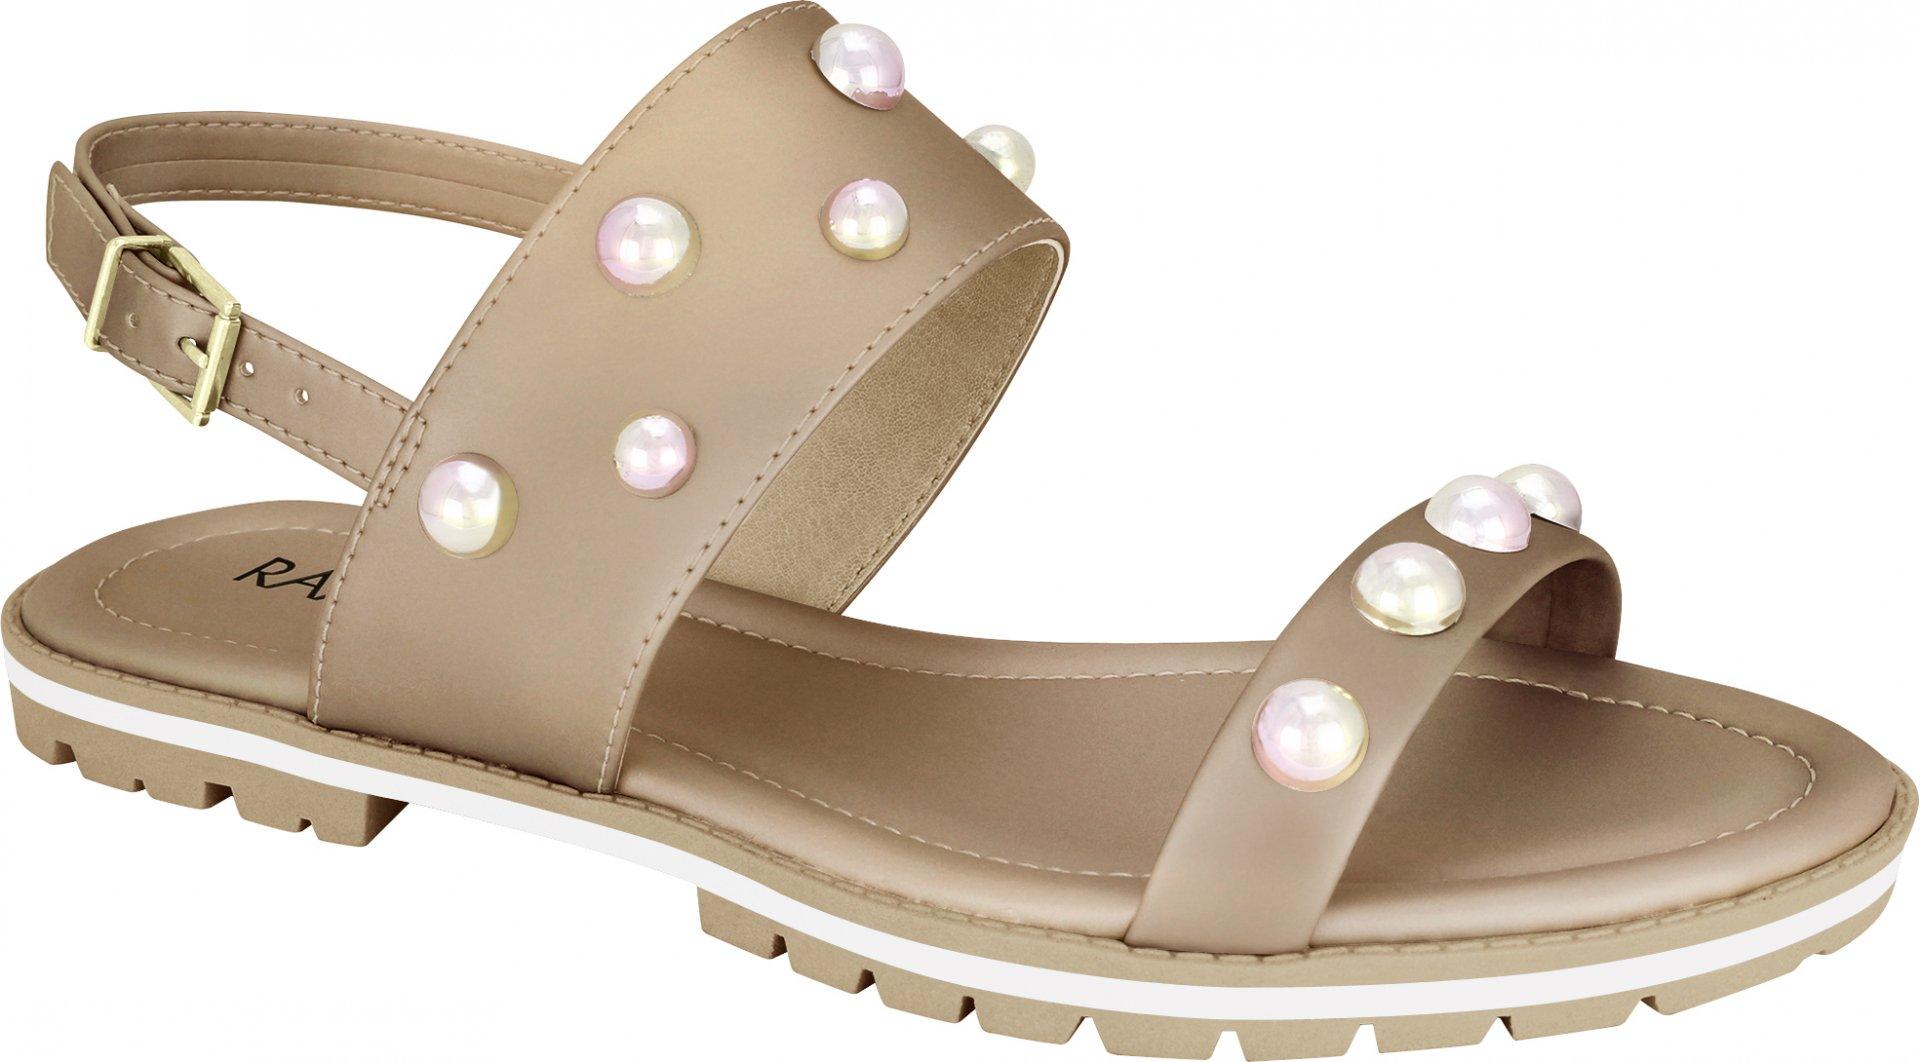 Sandals Ramarim Collection